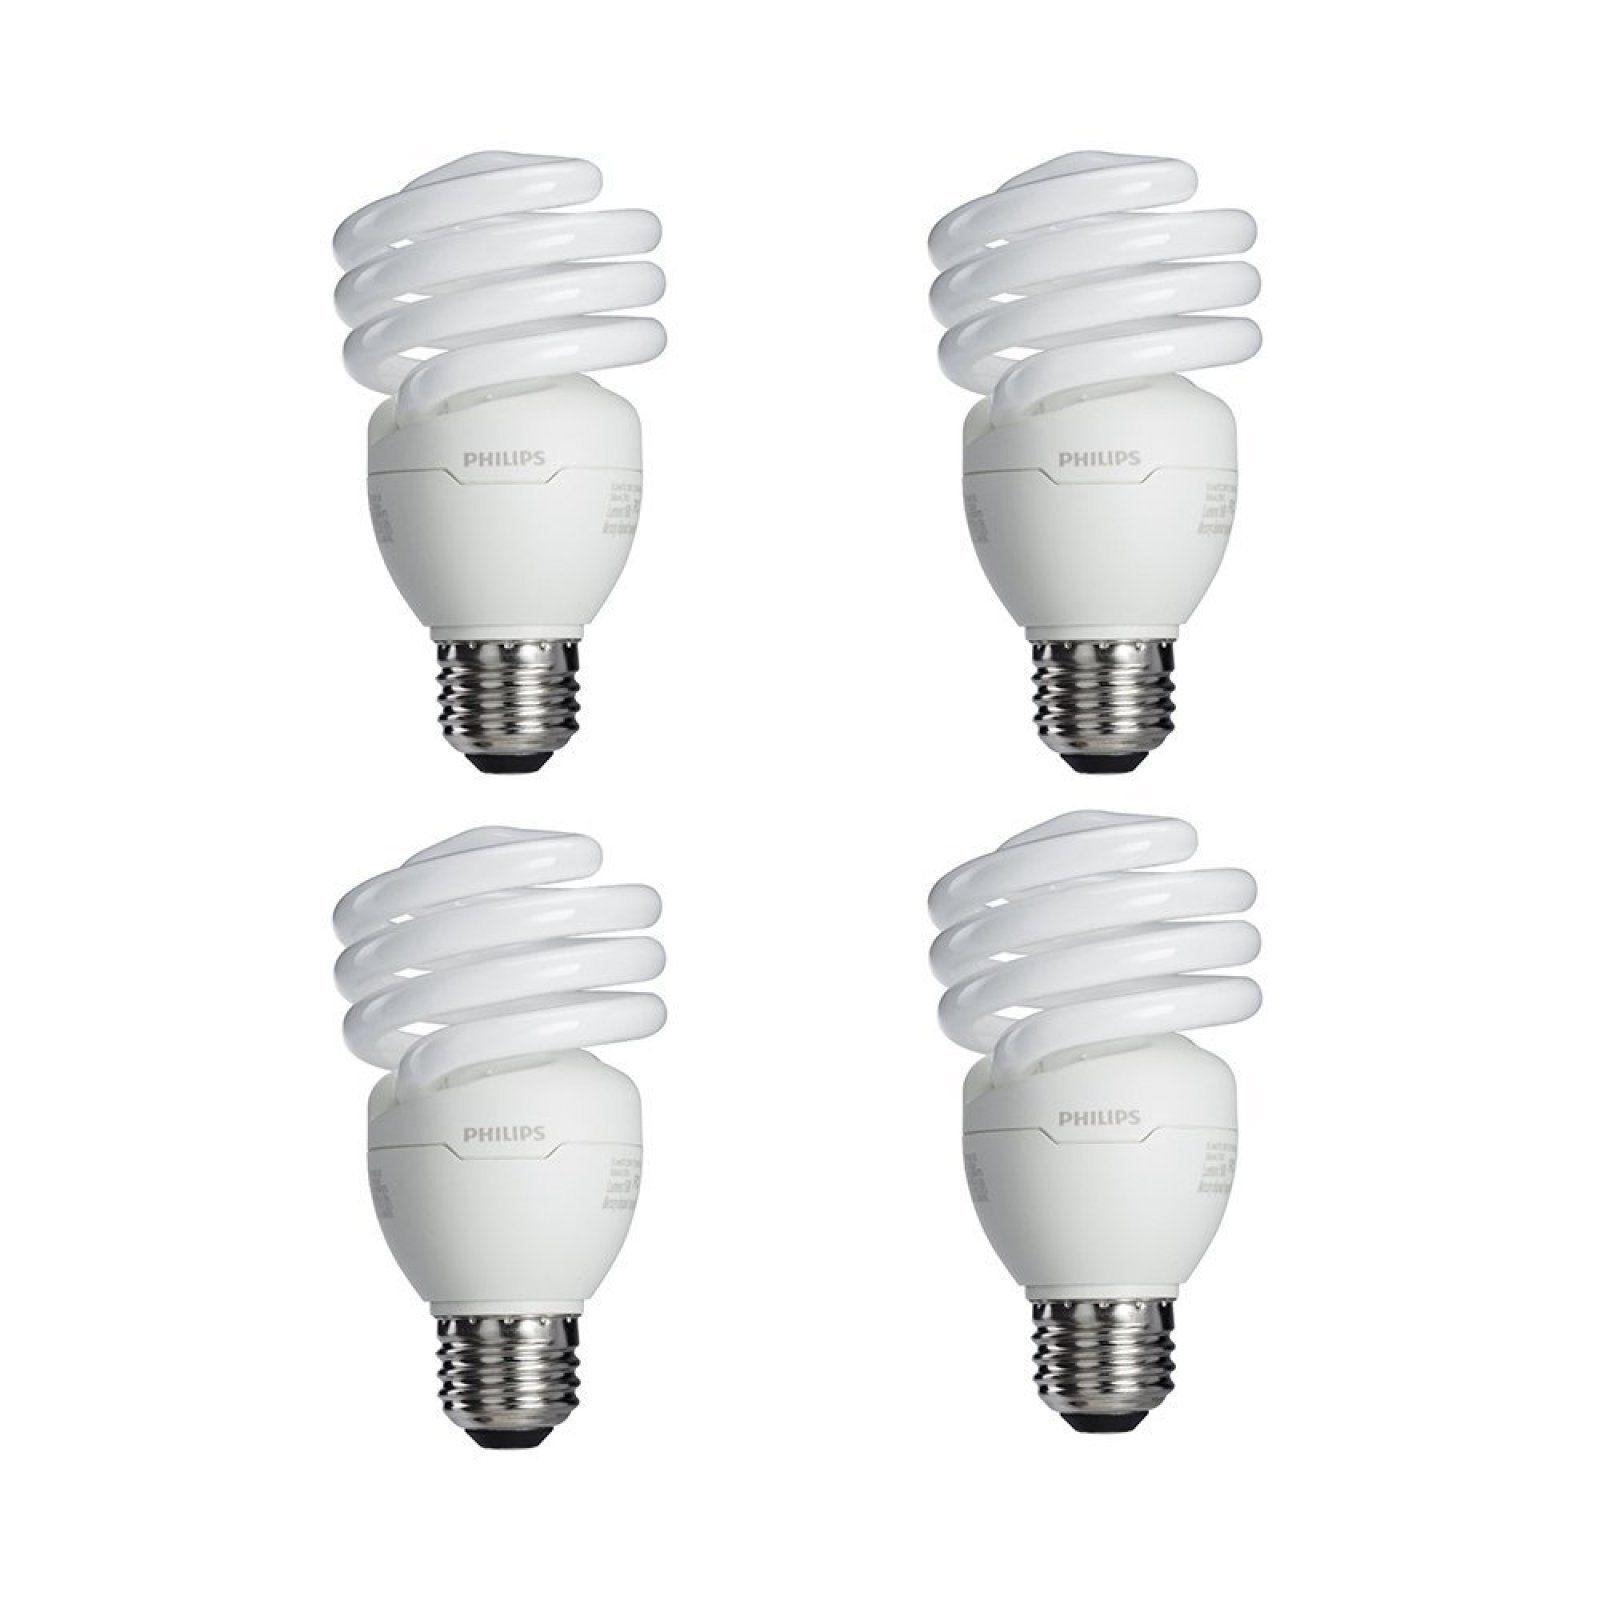 opal energy john cfl bulb spiral com buyphilips pdp lewis online at johnlewis lights saving rsp philips light main